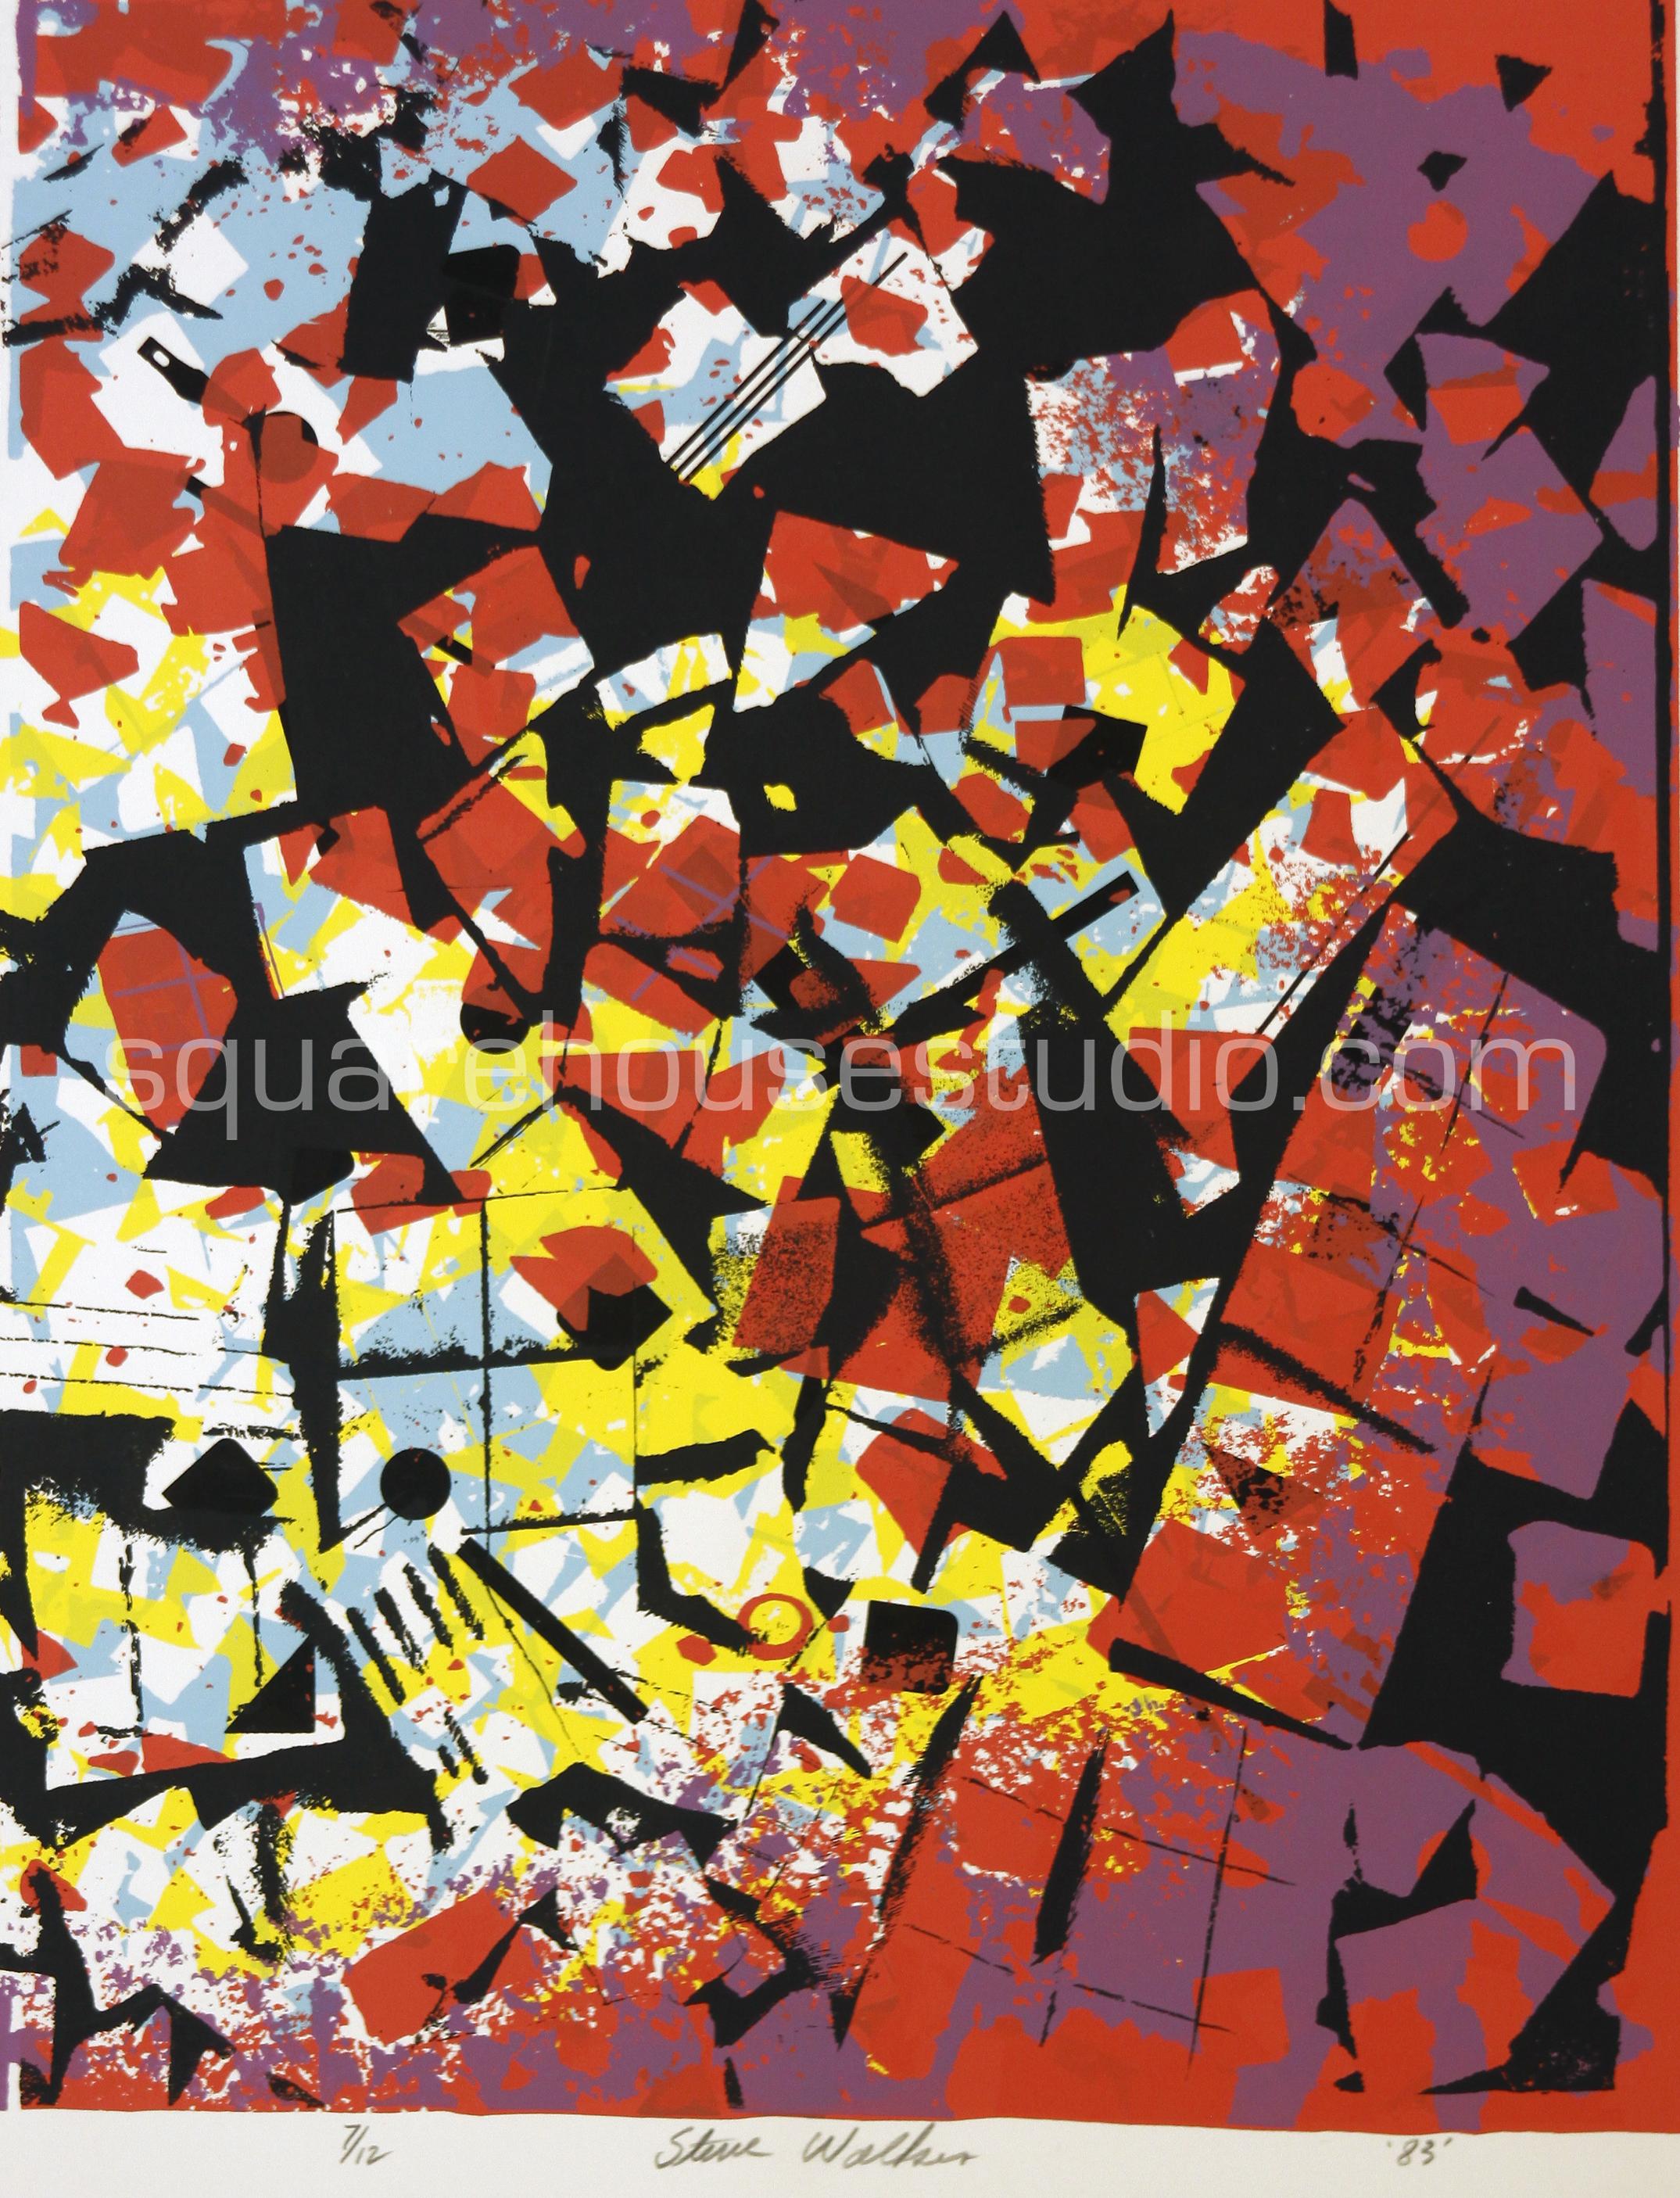 "Pink Tiles , 22"" x 32,"" original edition, $625 framed / $475 unframed, Available as giclée print—$450 framed / $300 unframed"